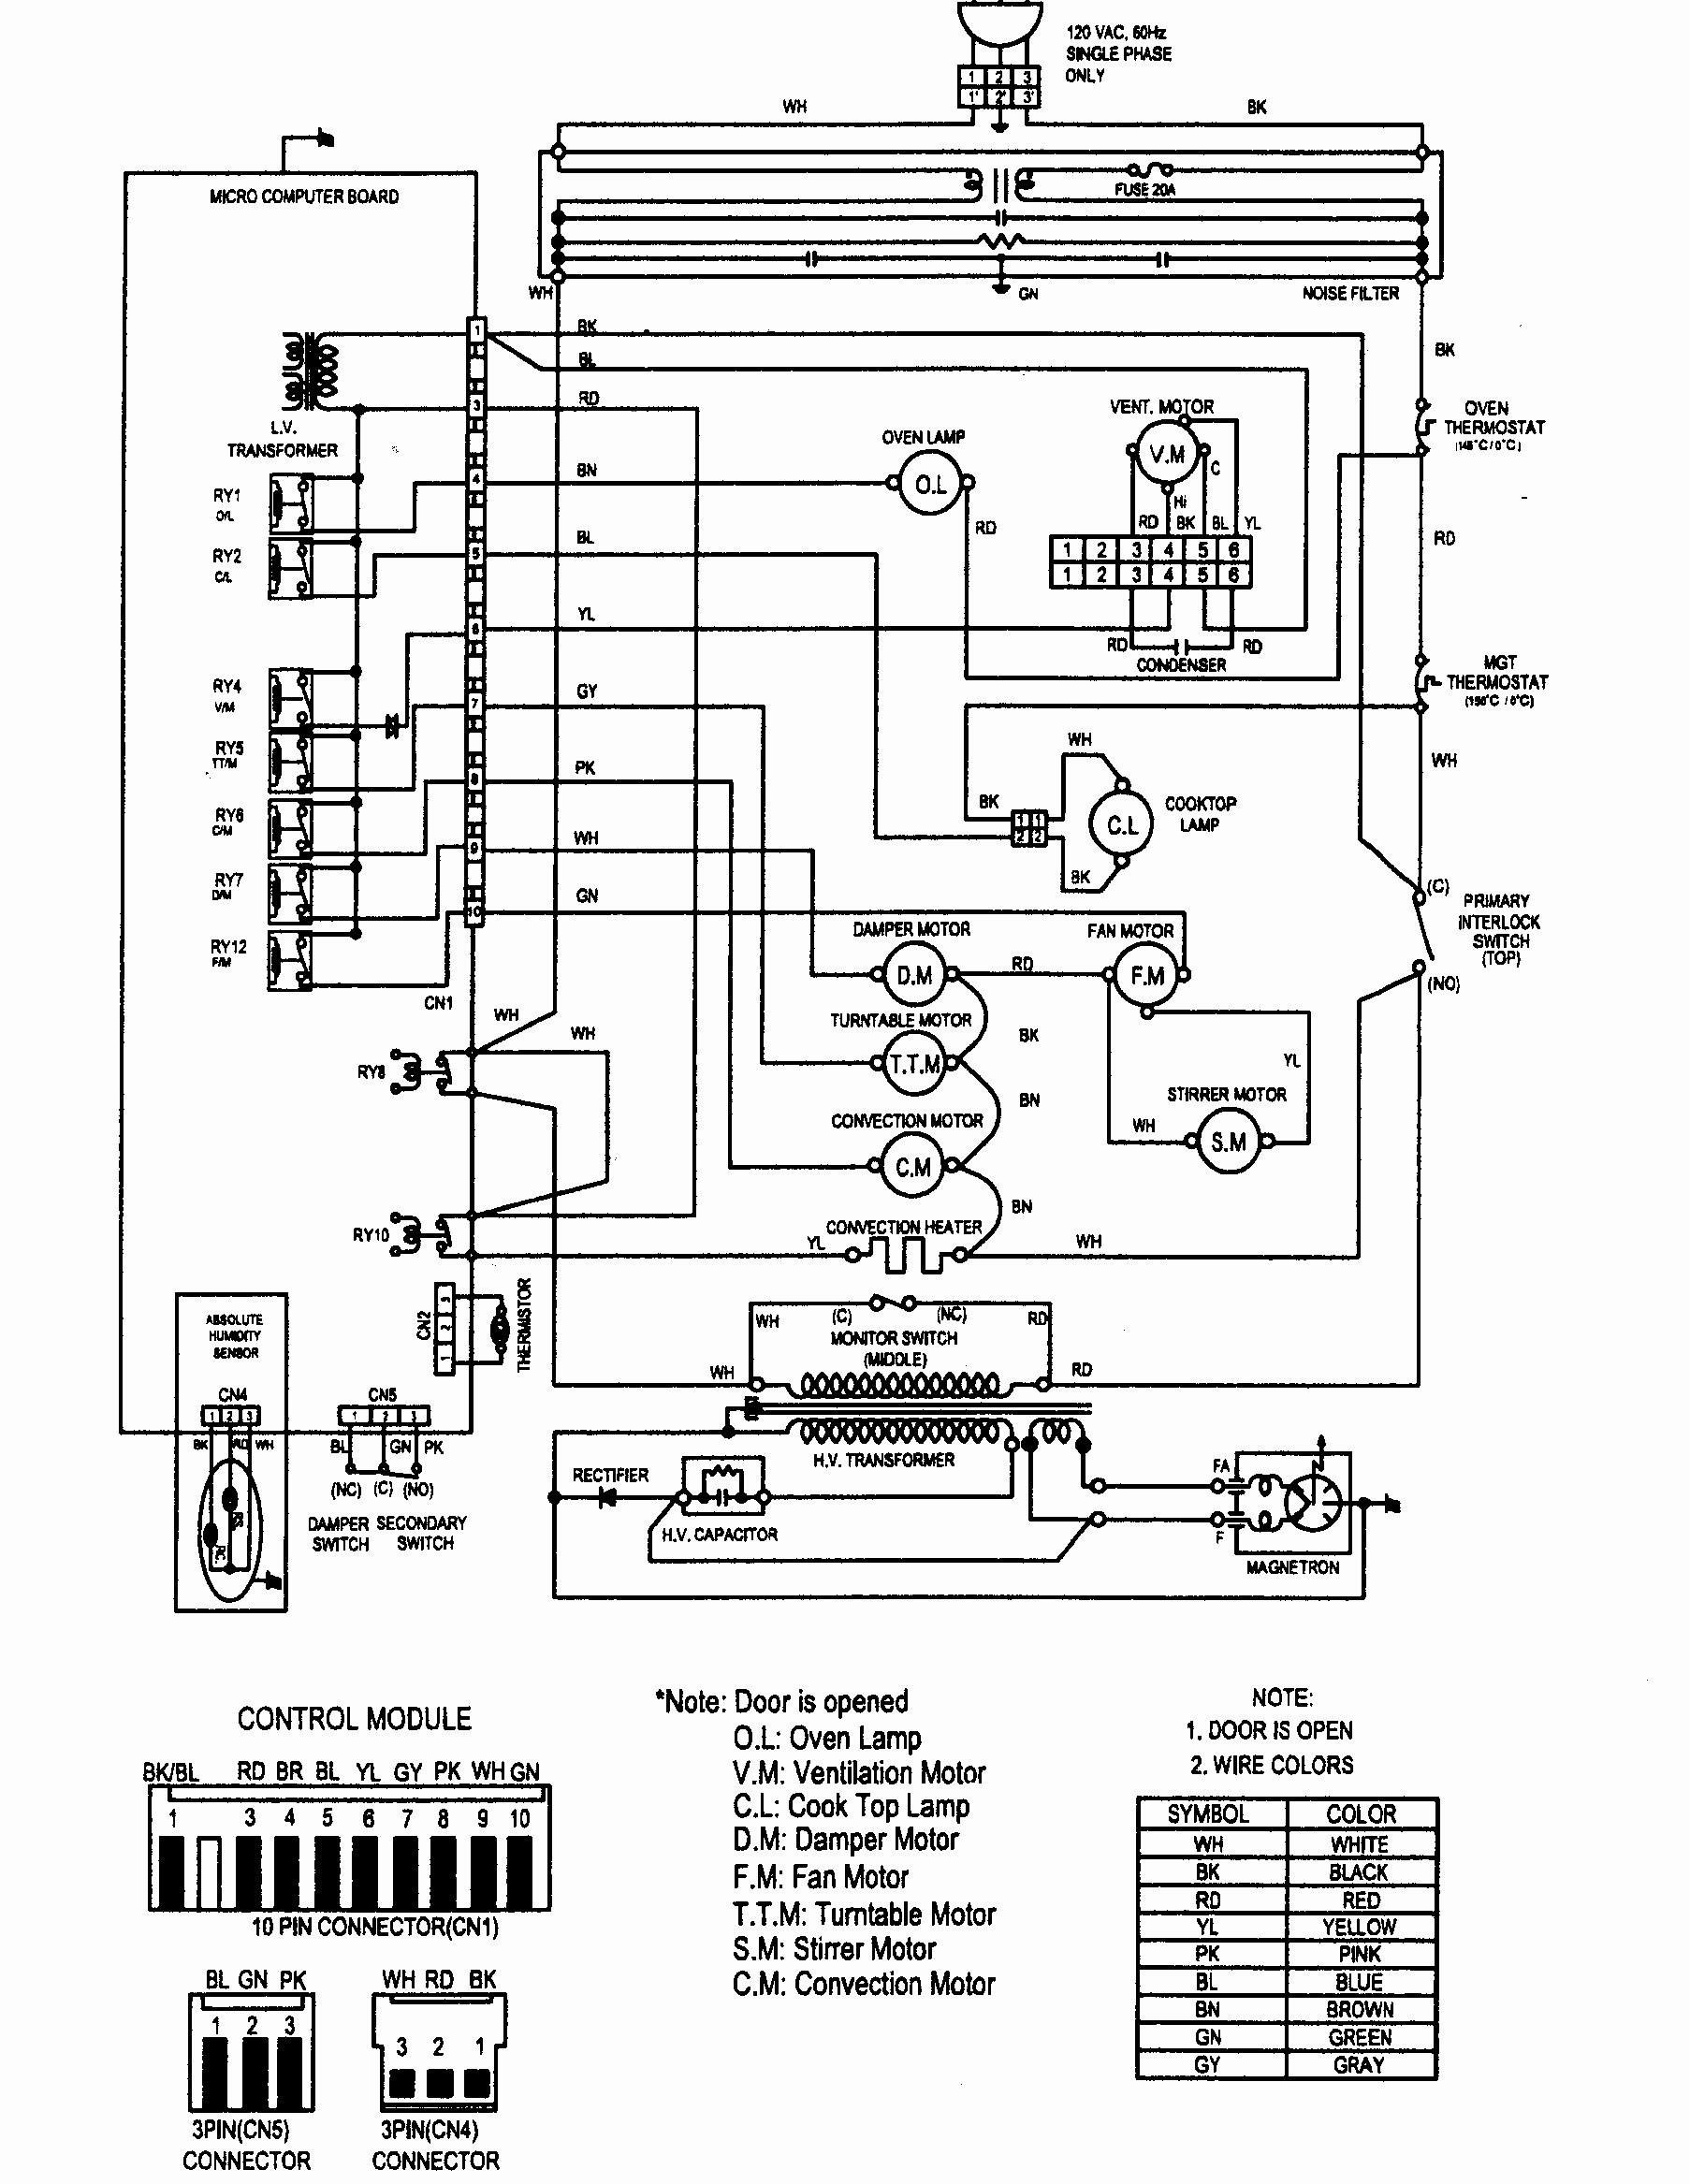 kenmore elite freezer wiring diagram 4k wiki wallpapers 2018. Black Bedroom Furniture Sets. Home Design Ideas